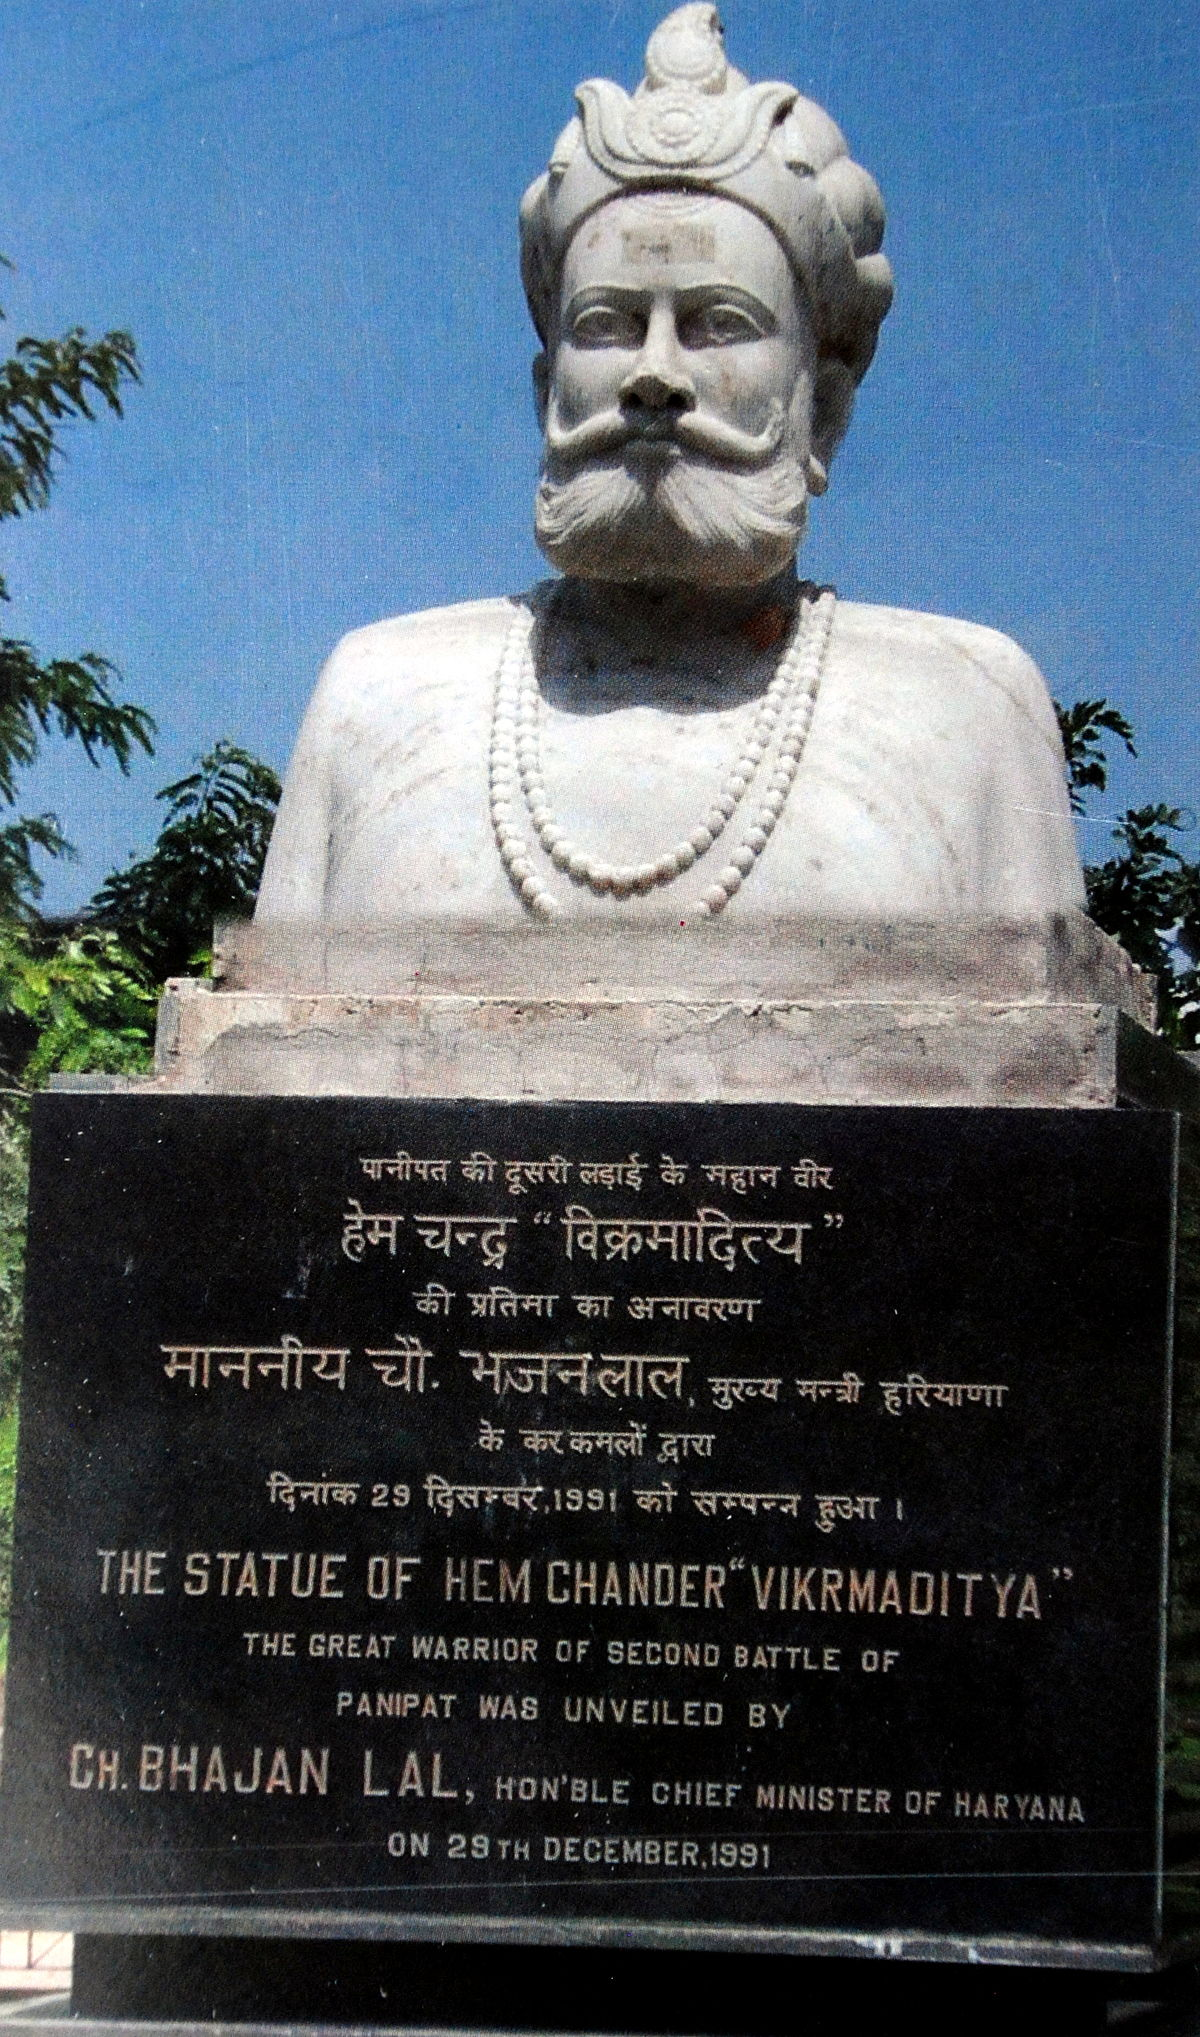 Second Battle of Panipat